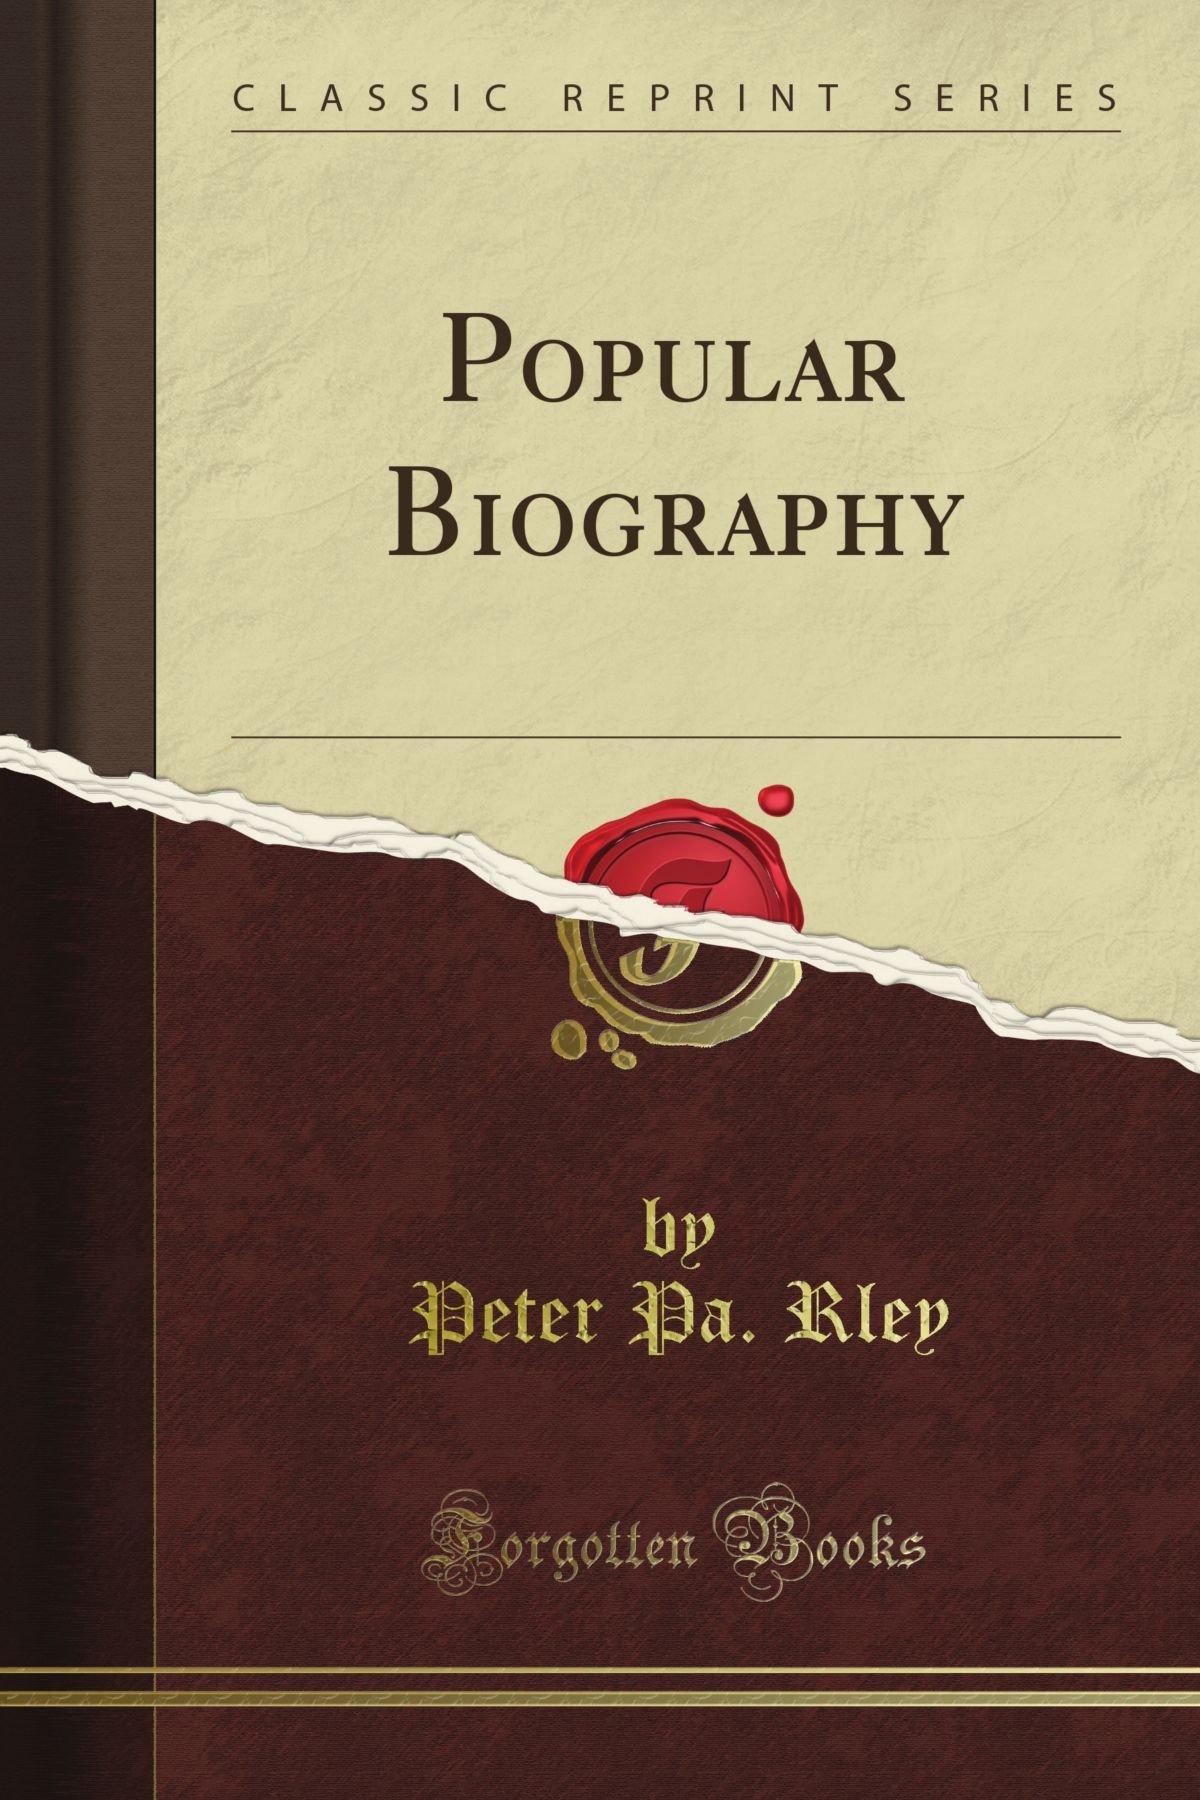 Popular Biography Classic Reprint Amazon Co Uk Peter Pa Rley Books